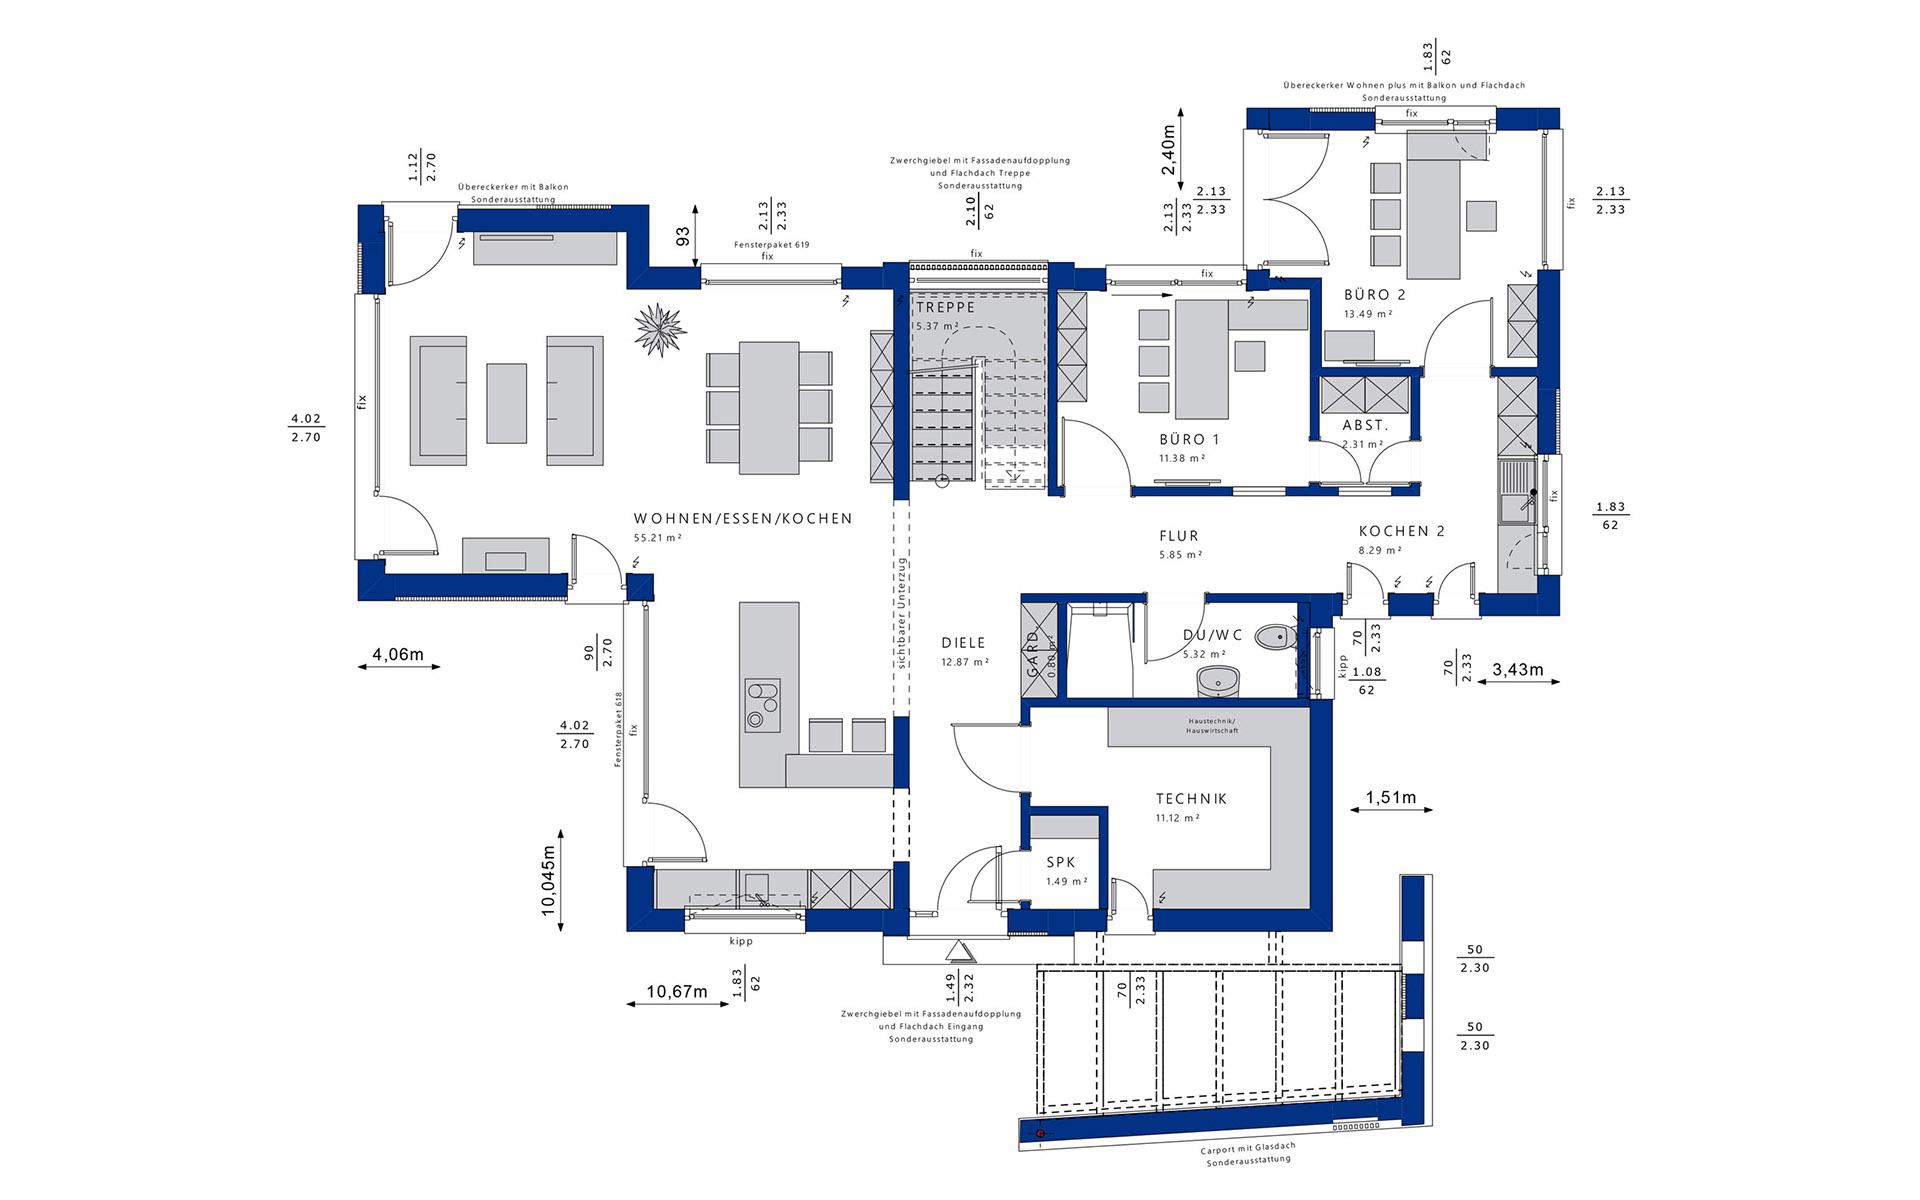 Erdgeschoss Concept-M 154 von Bien-Zenker GmbH